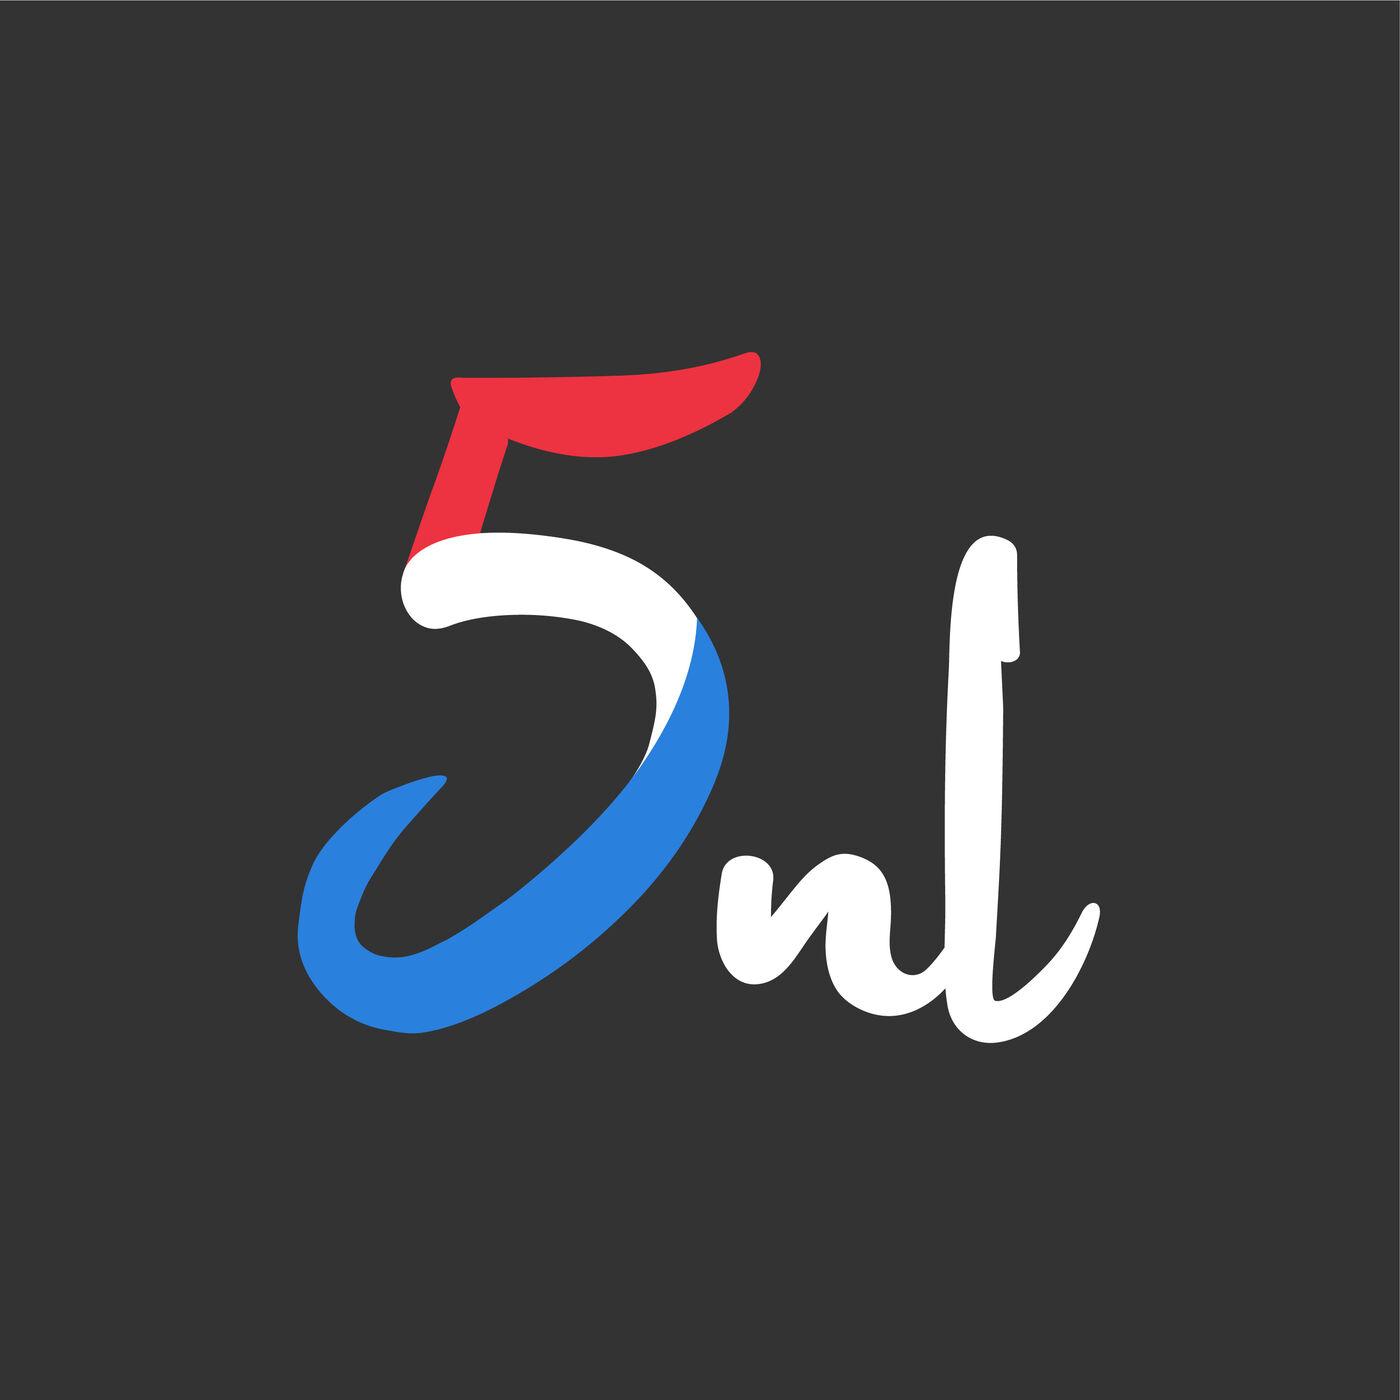 5-minuten Nederlands logo